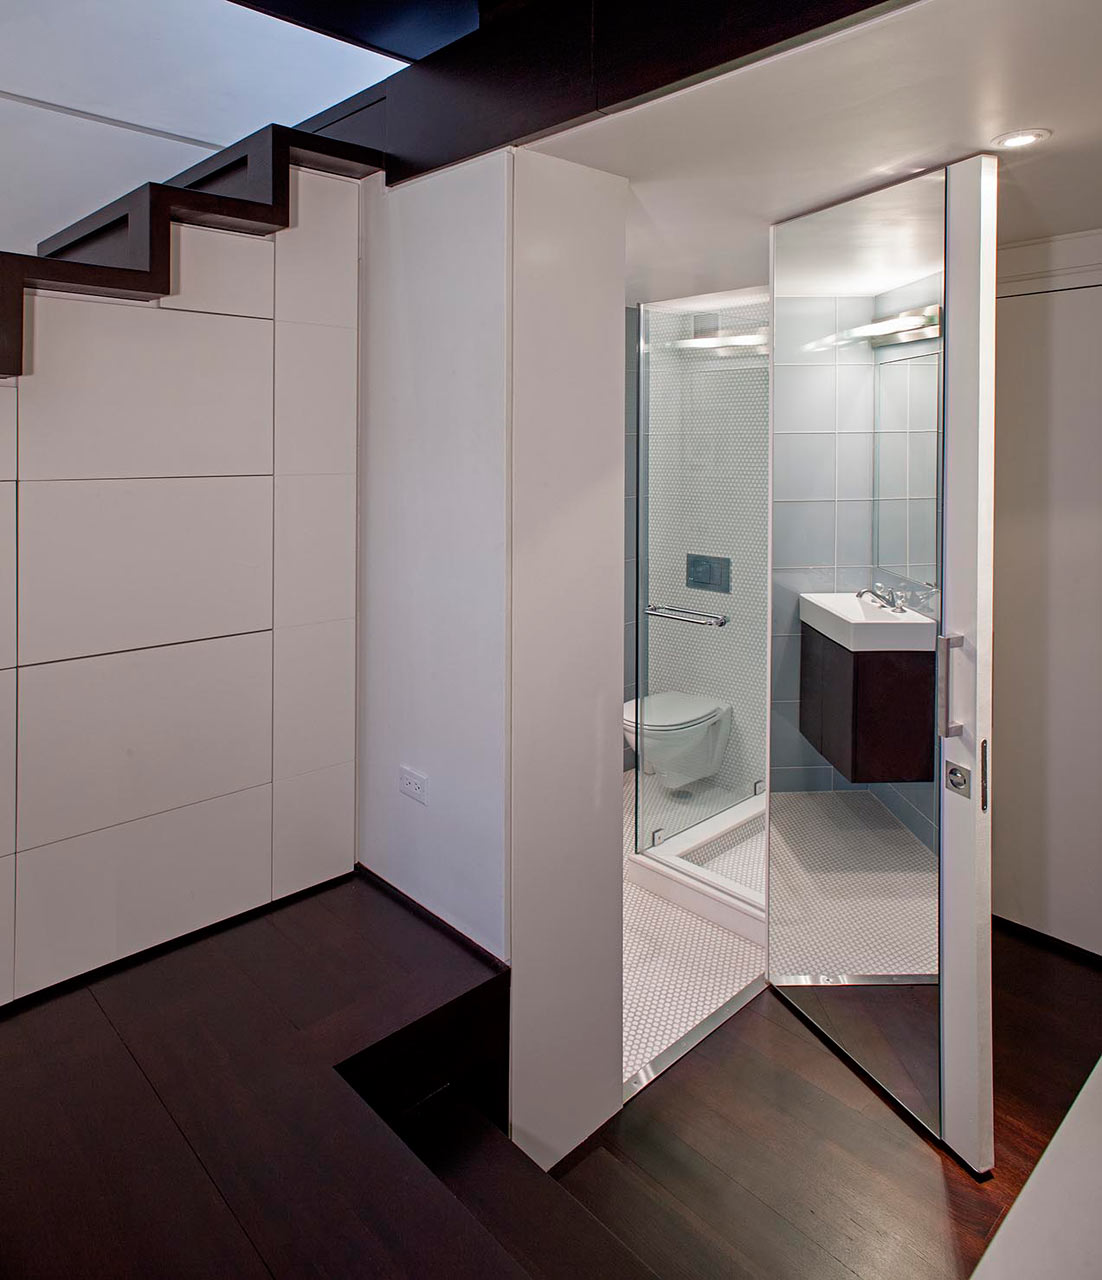 Specht-Harpman-Micro-Loft-3-bath